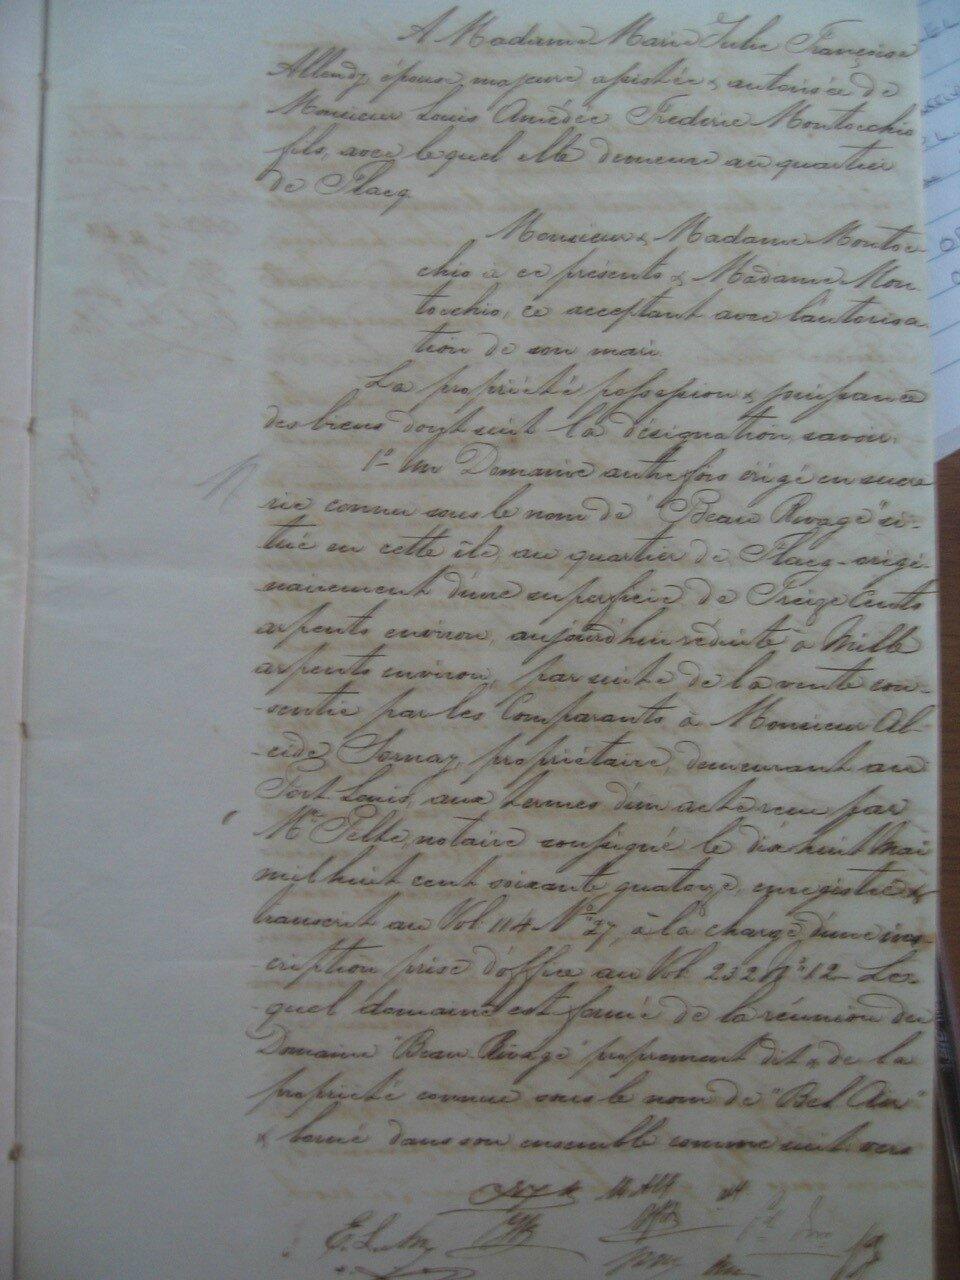 Beau Rivage_Contrat de vente 1878 p4_Marie Helene SHIM